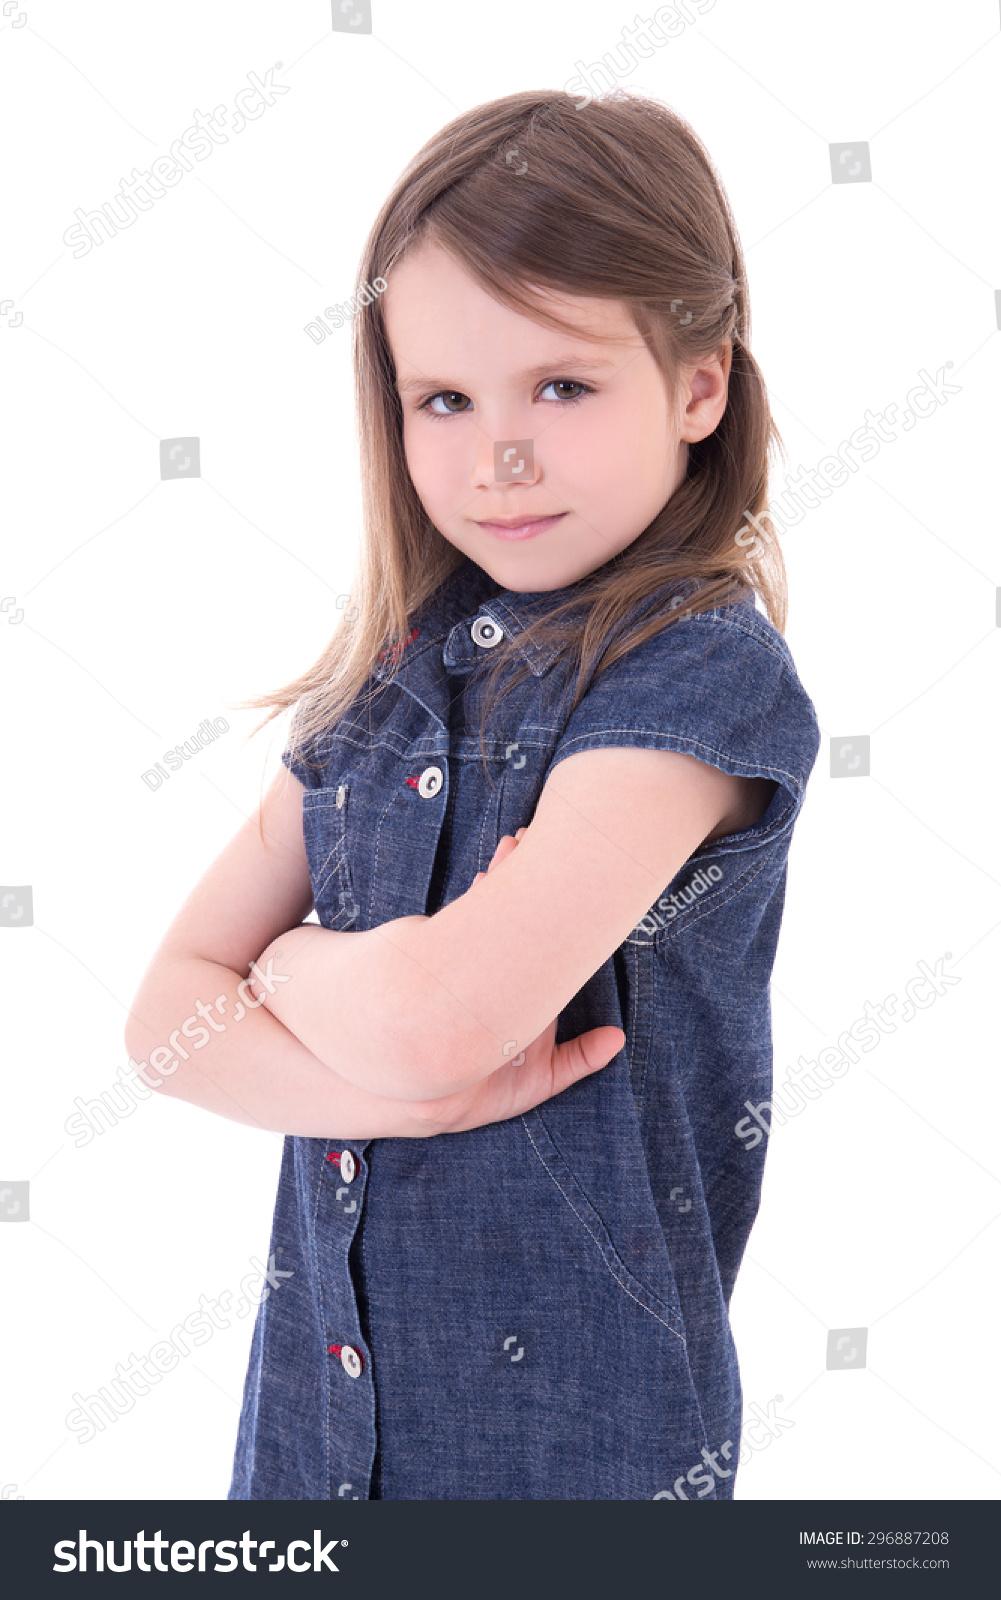 8894fec0416 portrait of funny cute little girl in denim dress isolated on white  background